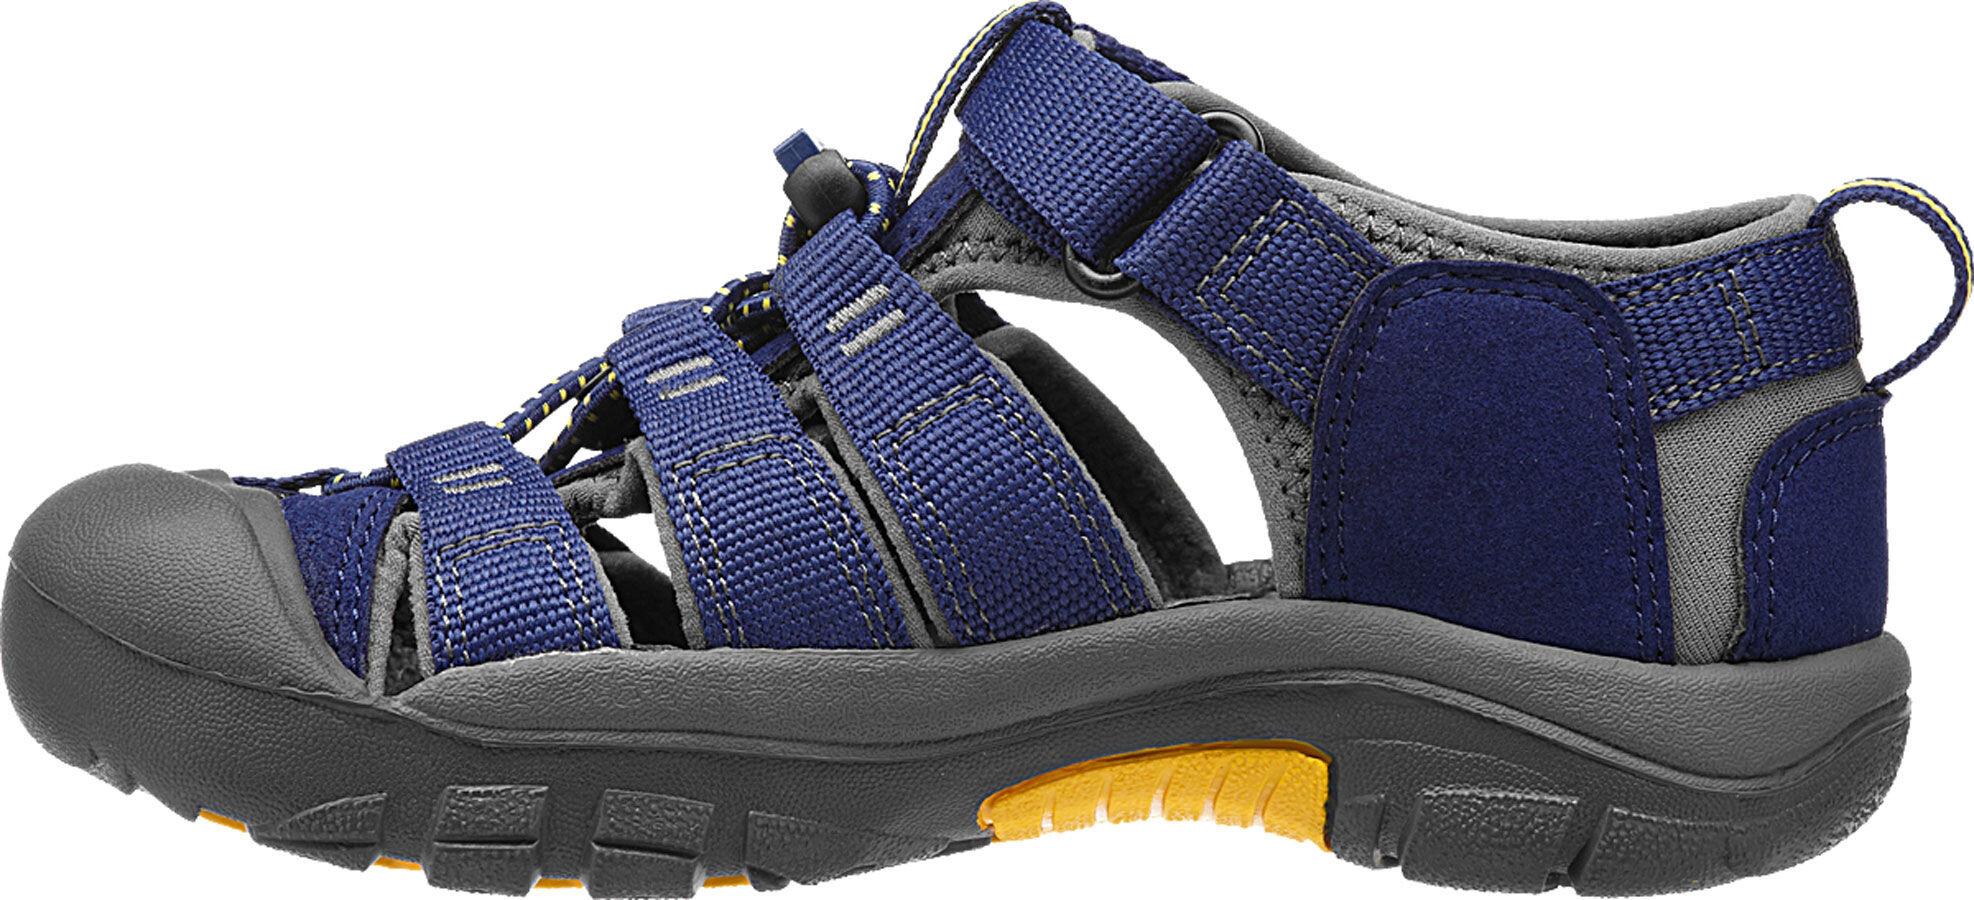 ef8a28ca1cf Keen Newport H2 - Sandalias Niños - azul